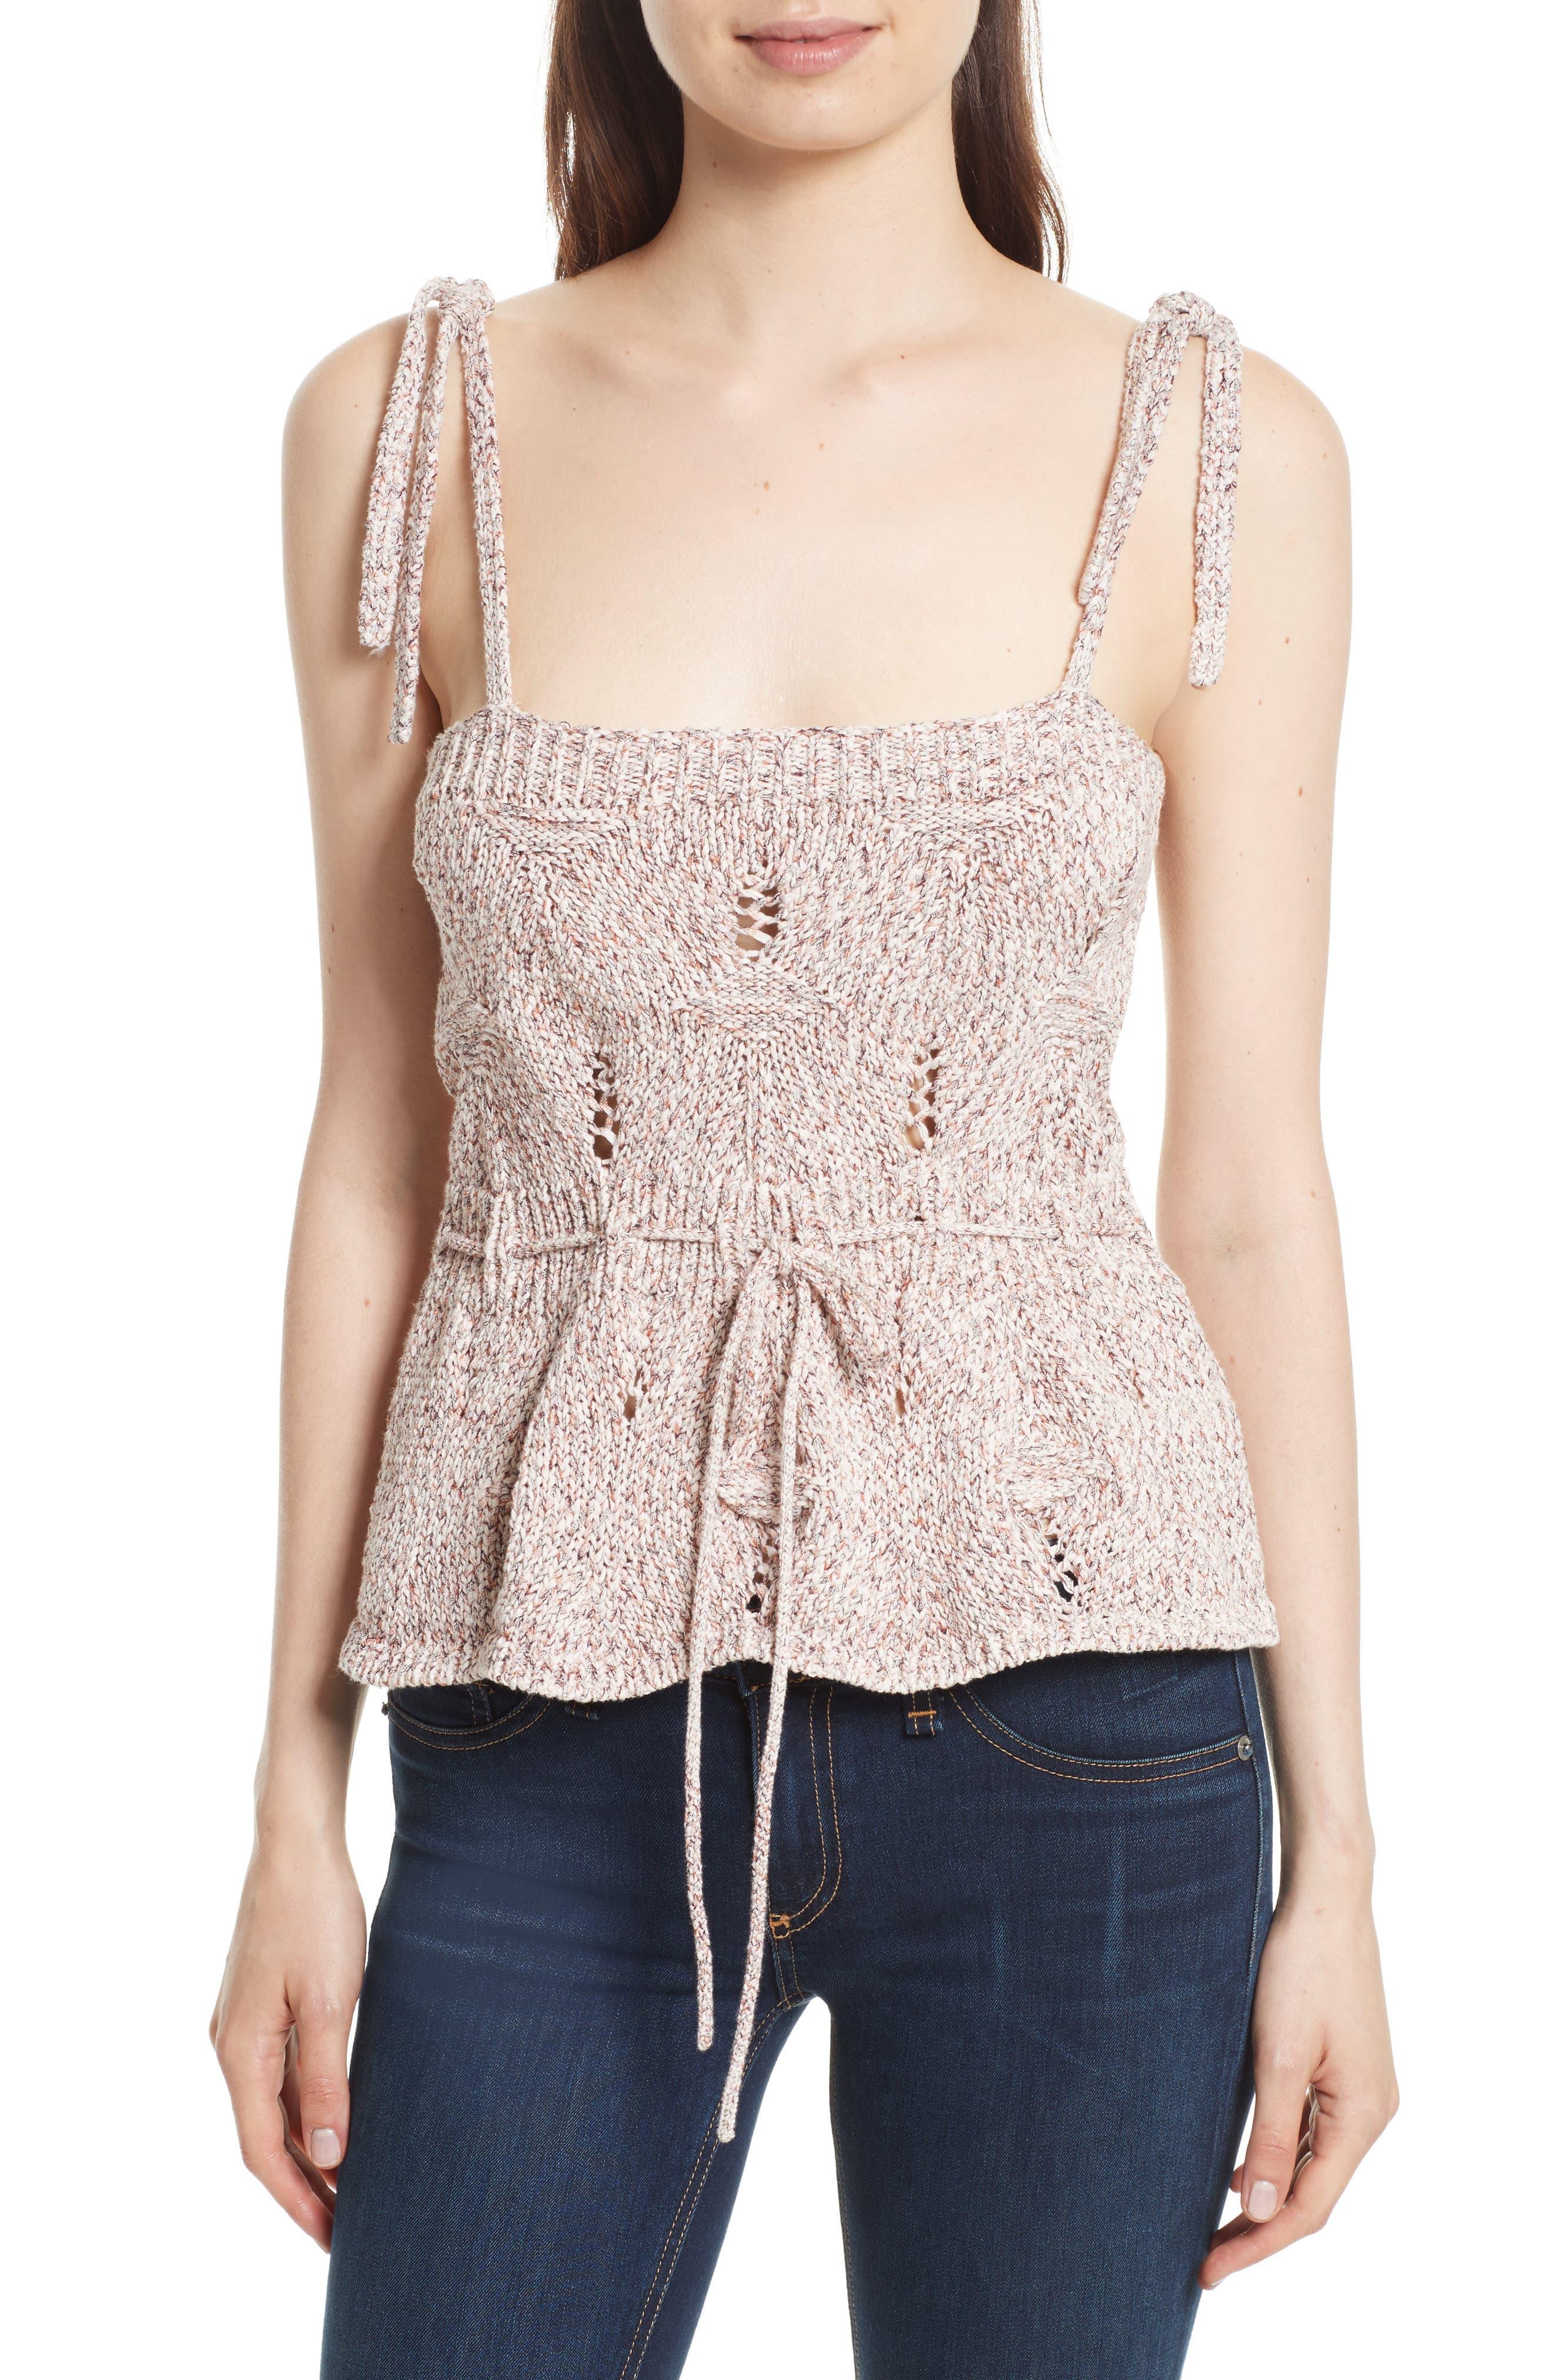 La Vie Rebecca Taylor Summer Ribbon Knit Tank